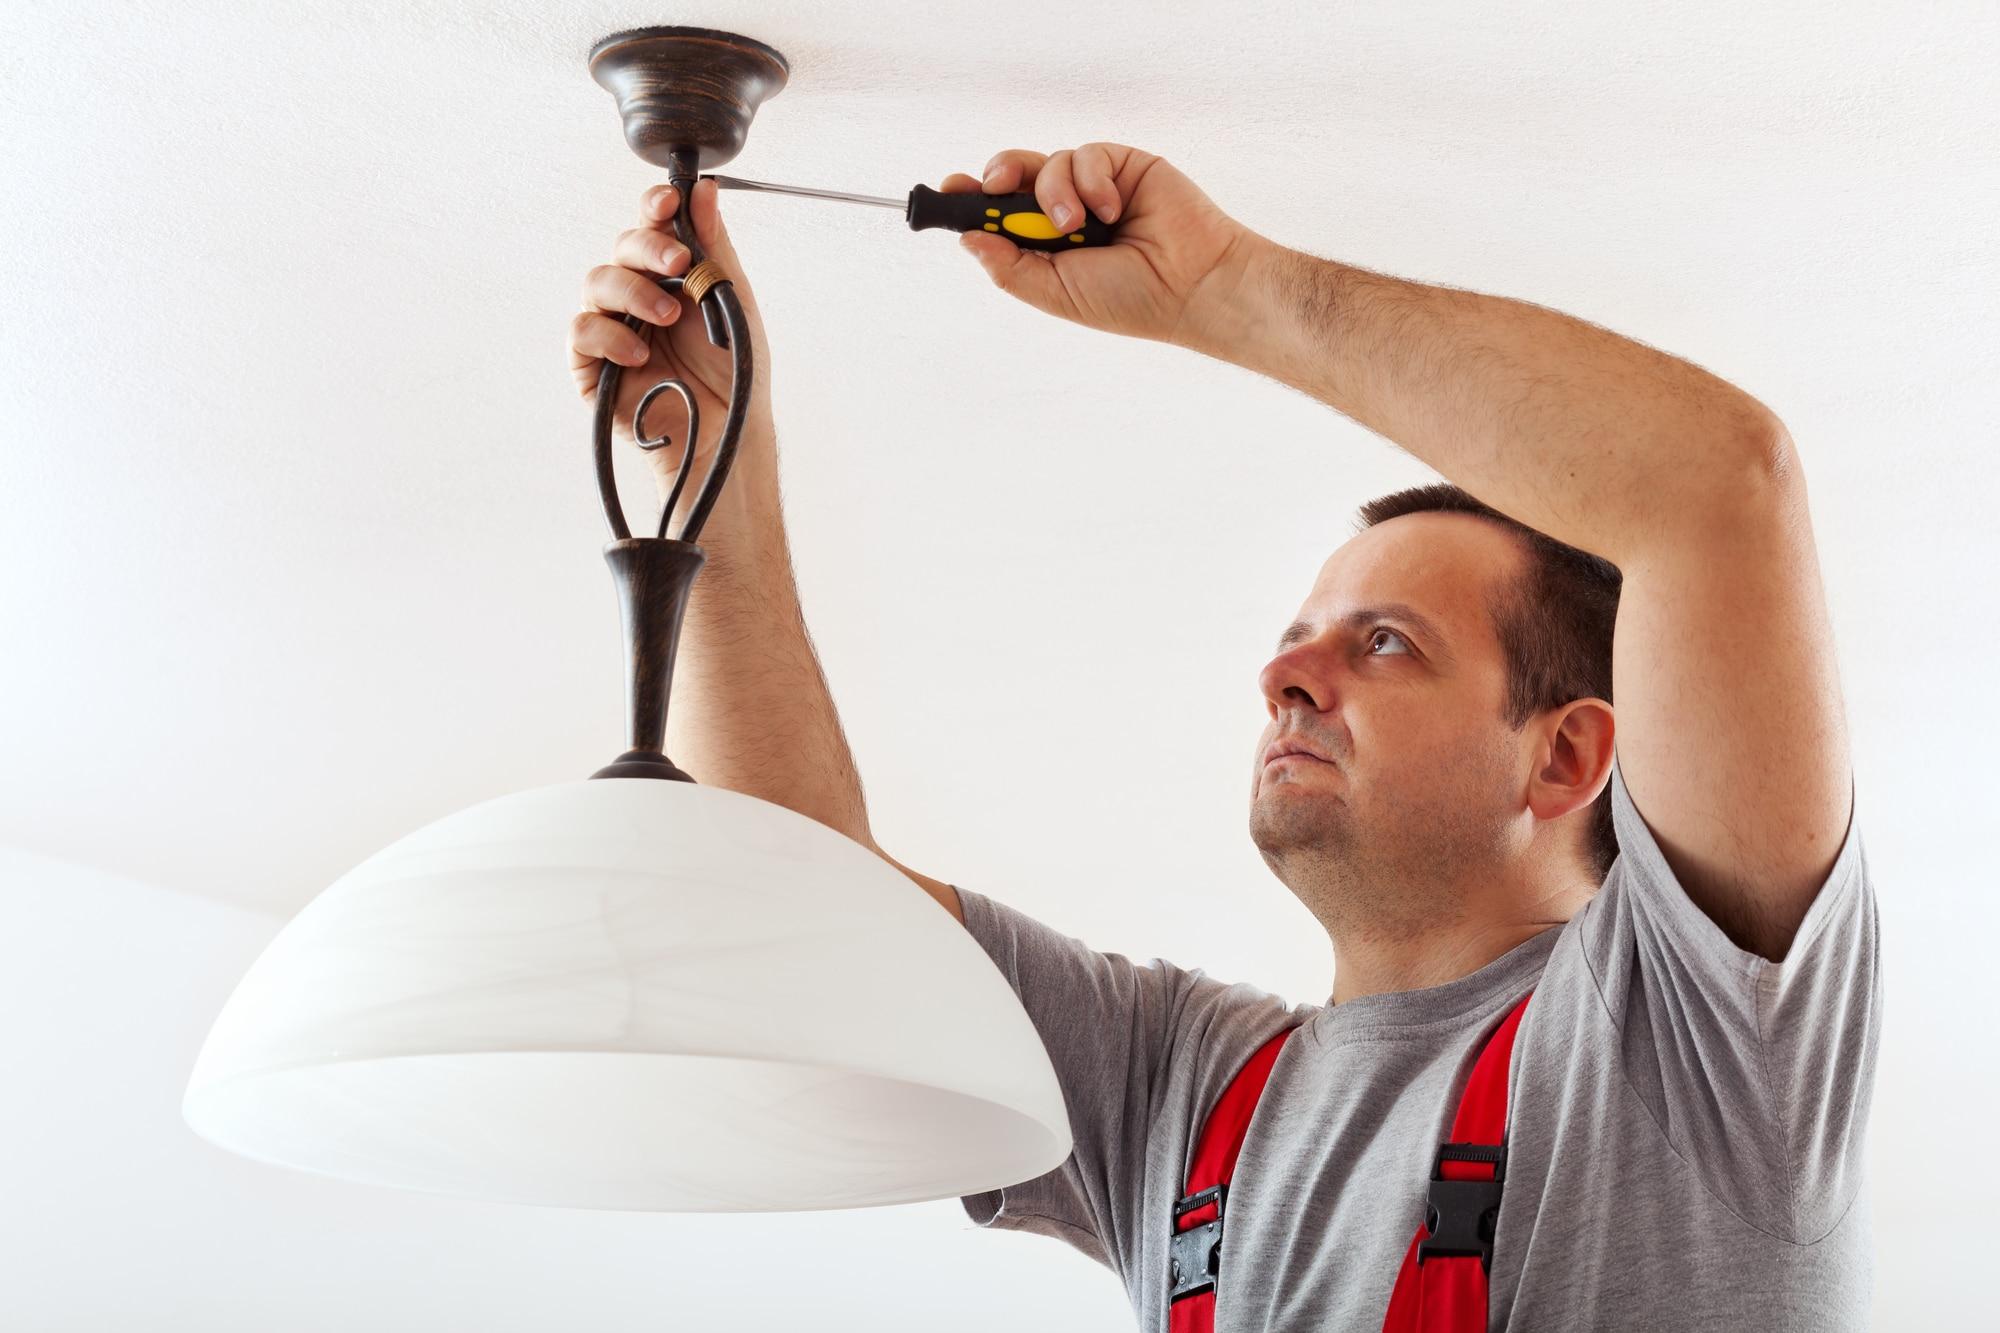 gloeilampen duurder dan led verlichting elektricien nijmegen. Black Bedroom Furniture Sets. Home Design Ideas